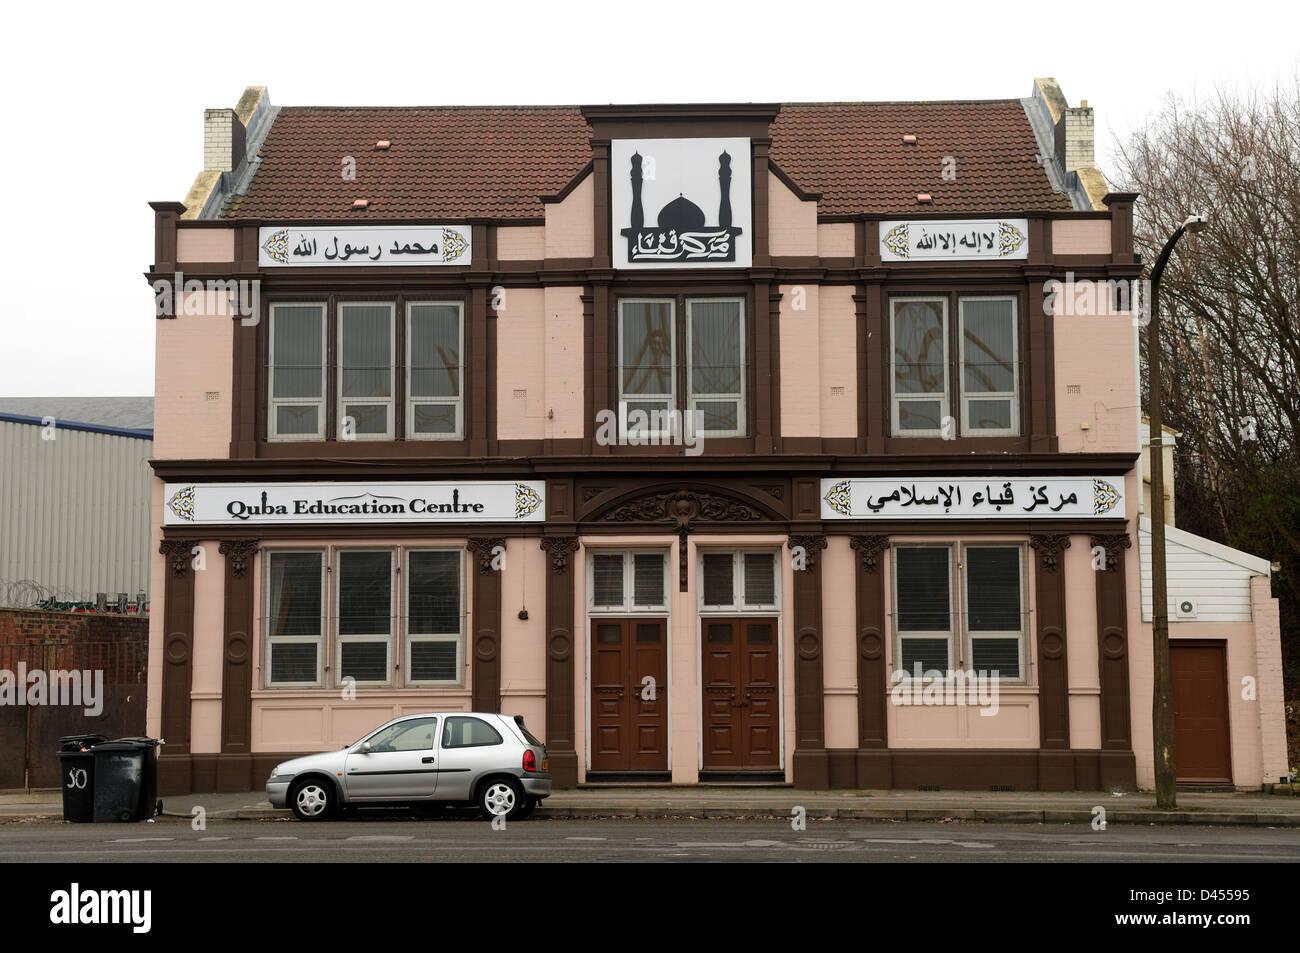 Quba Education Center,Attercliffe,Sheffield.UK. - Stock Image